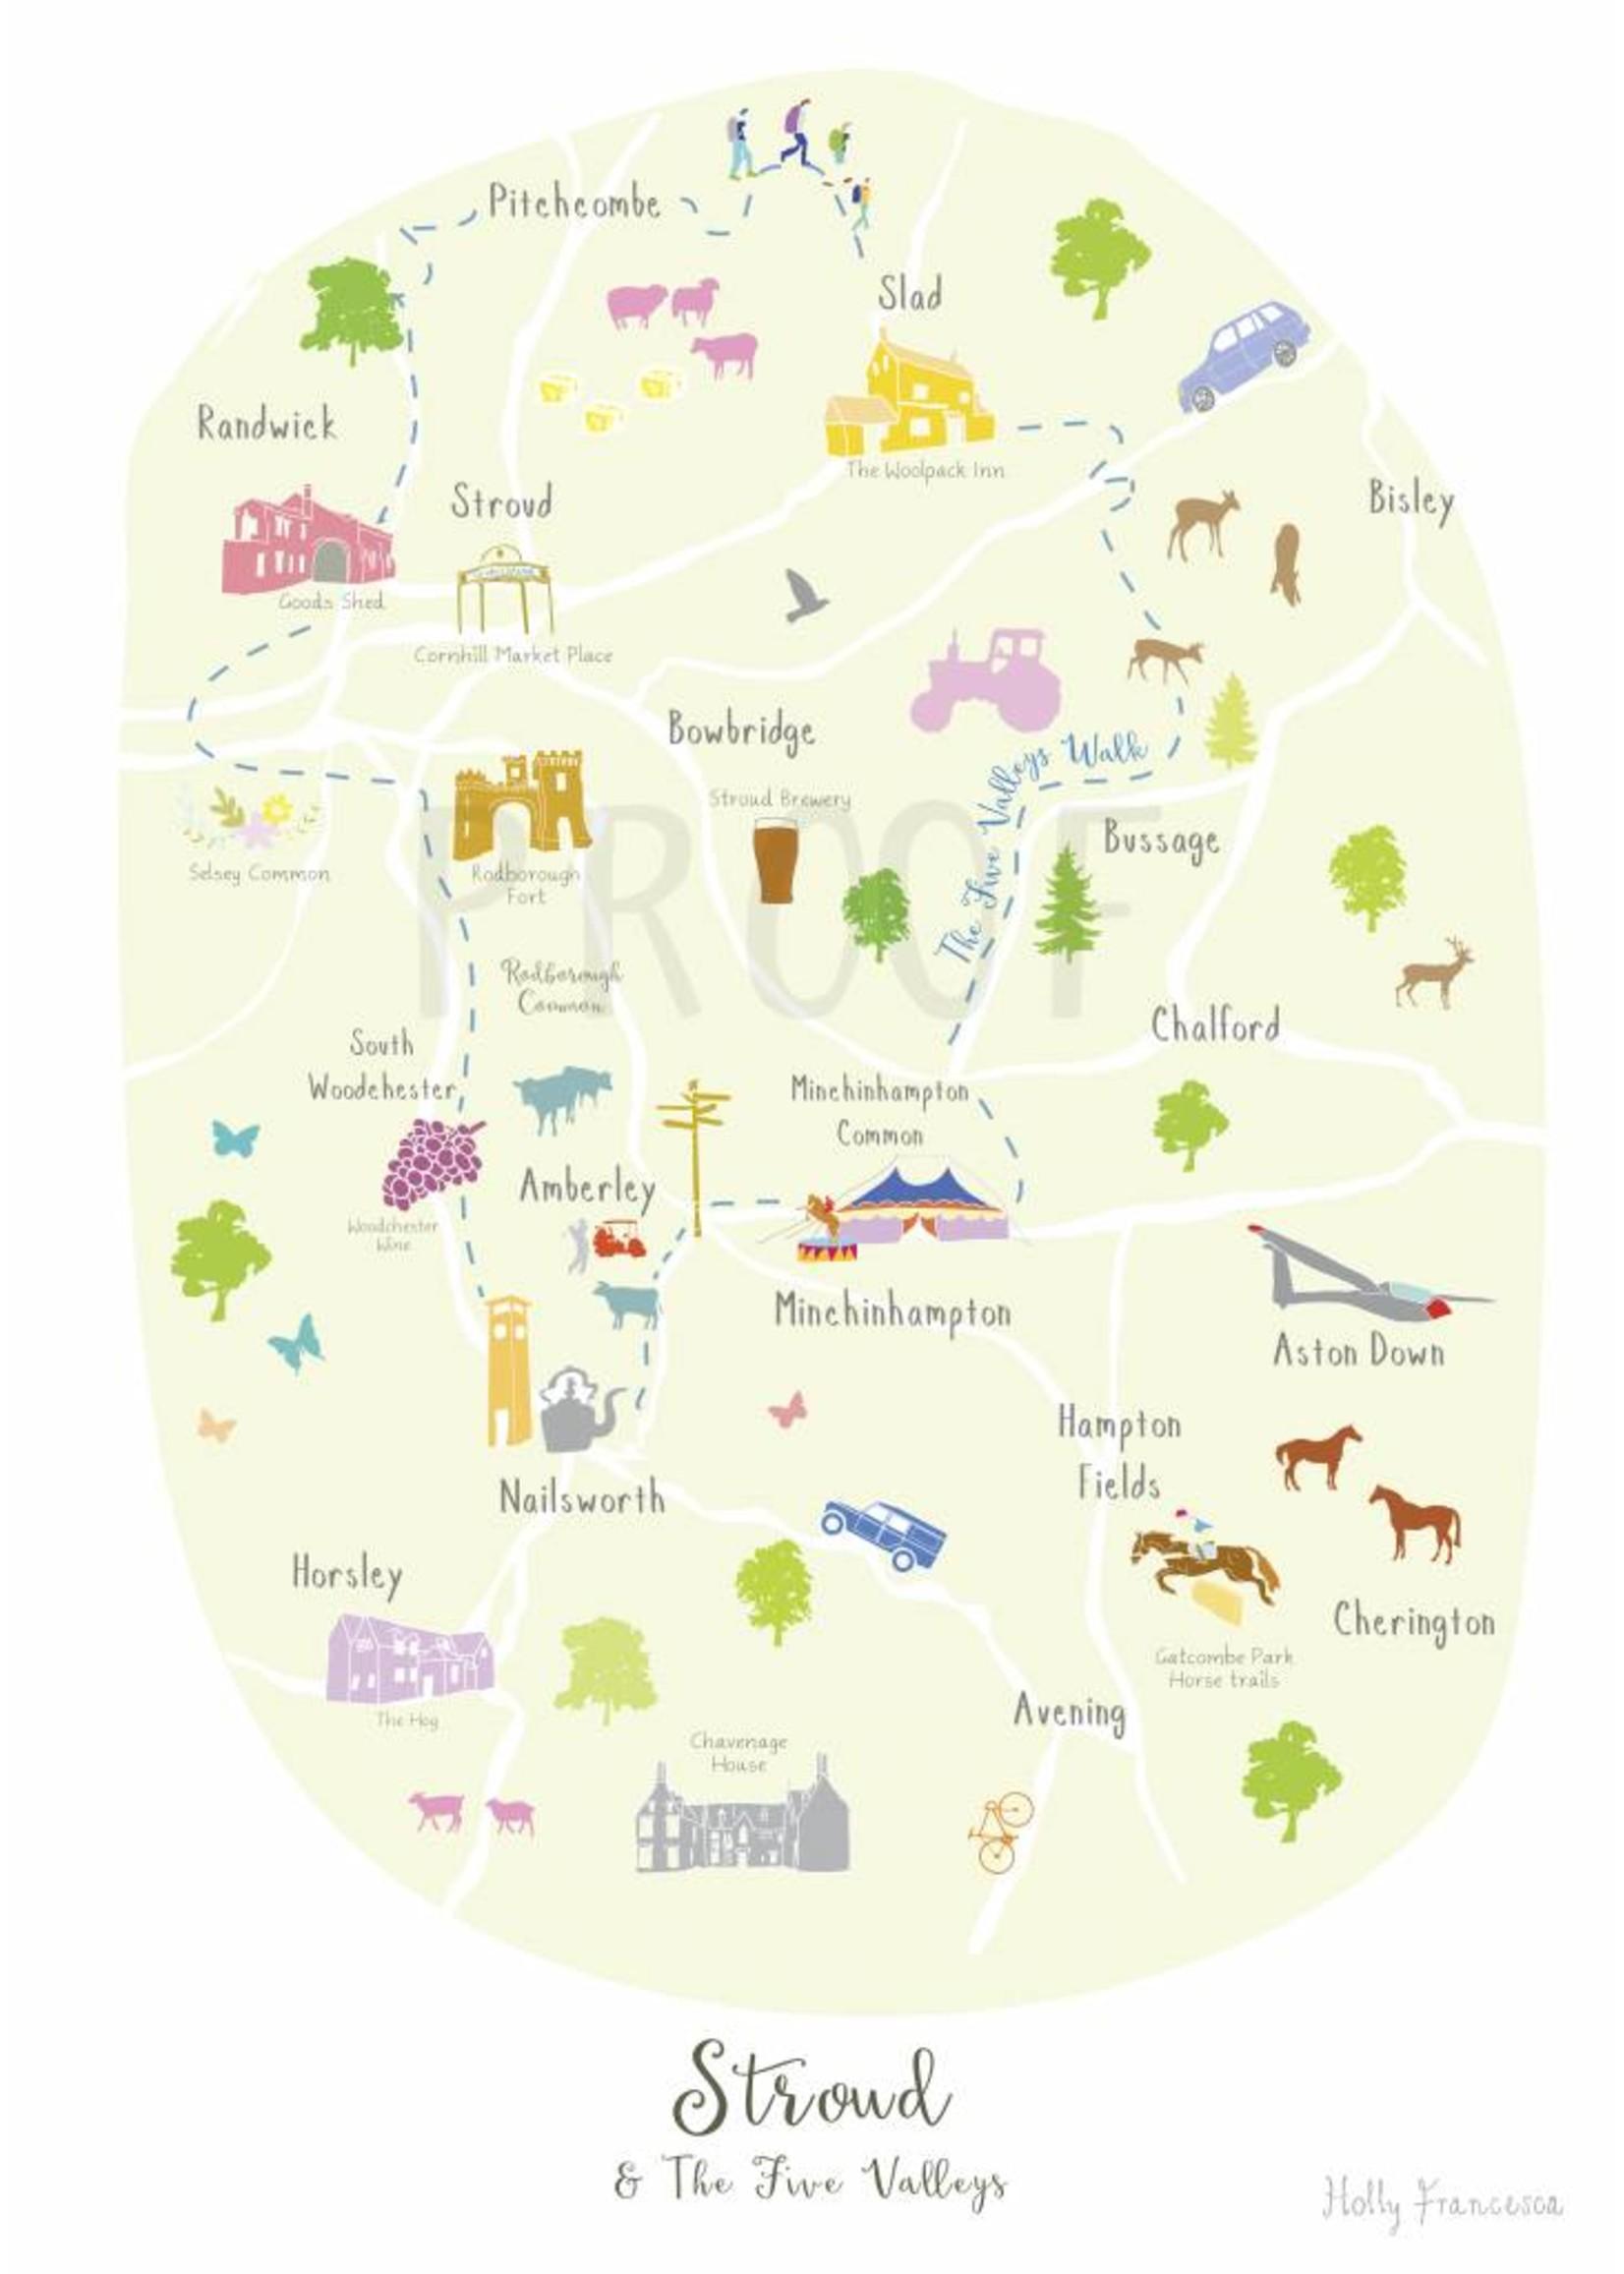 Holly Francesca Holly Francesca Map of Stroud & the 5 Valleys - A3